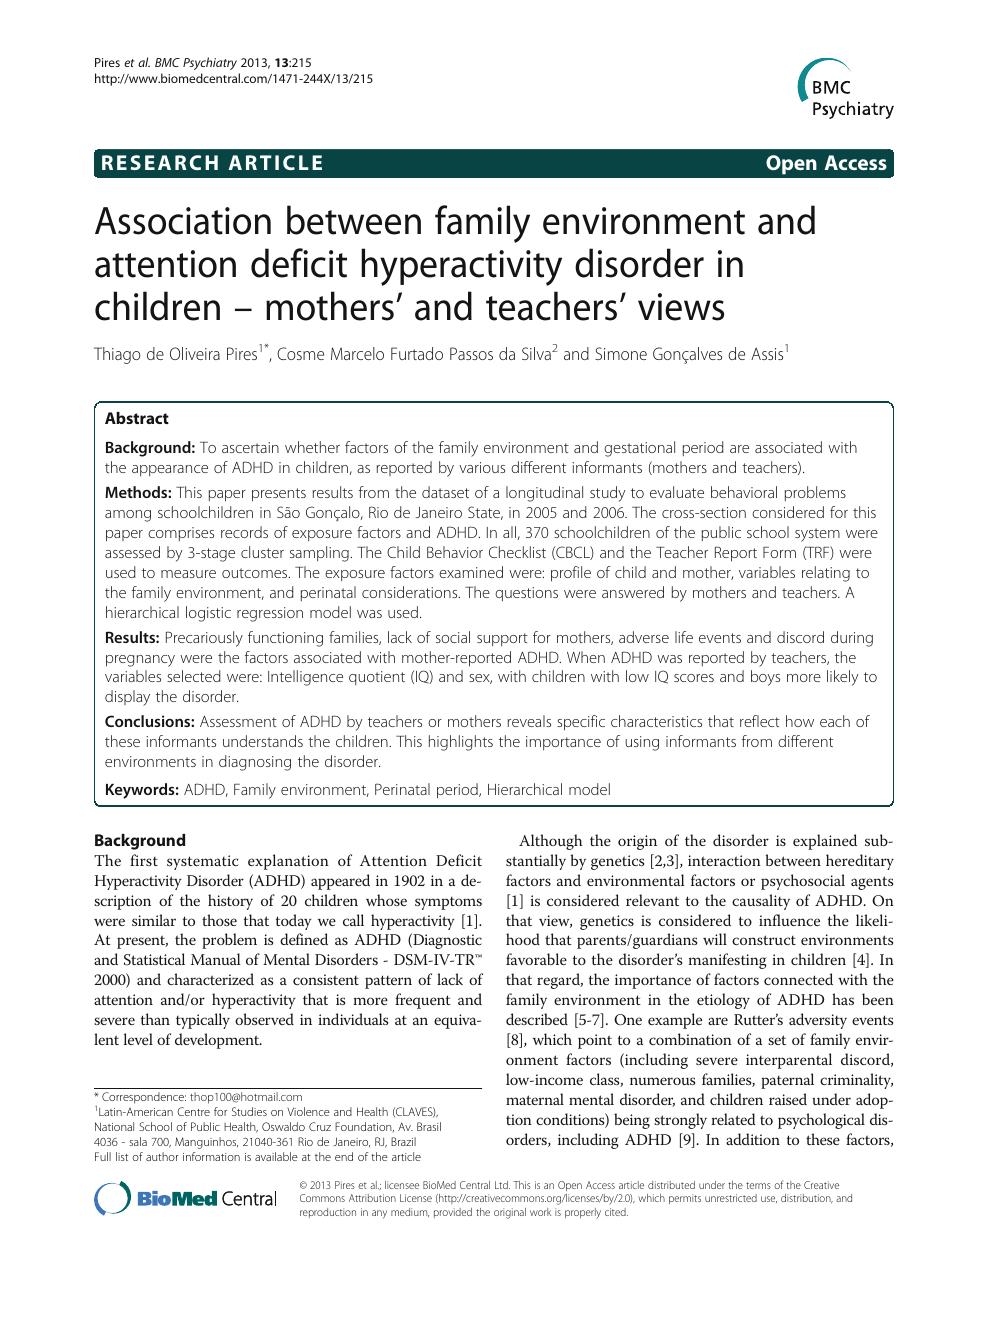 family studies research topics